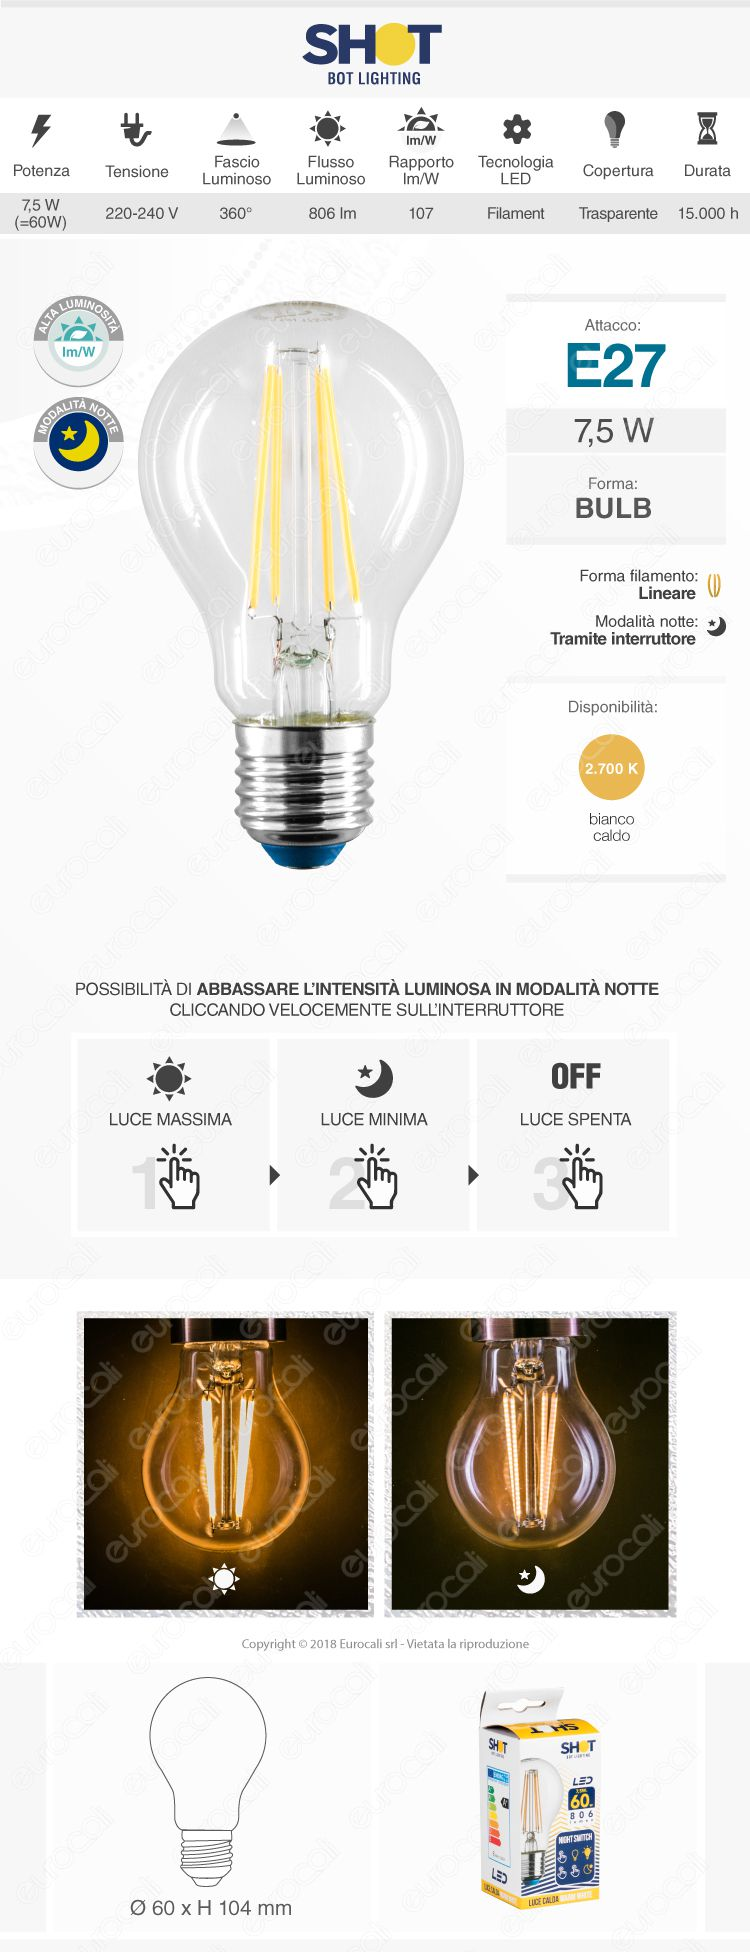 Bot Lighting lampadina LED E27